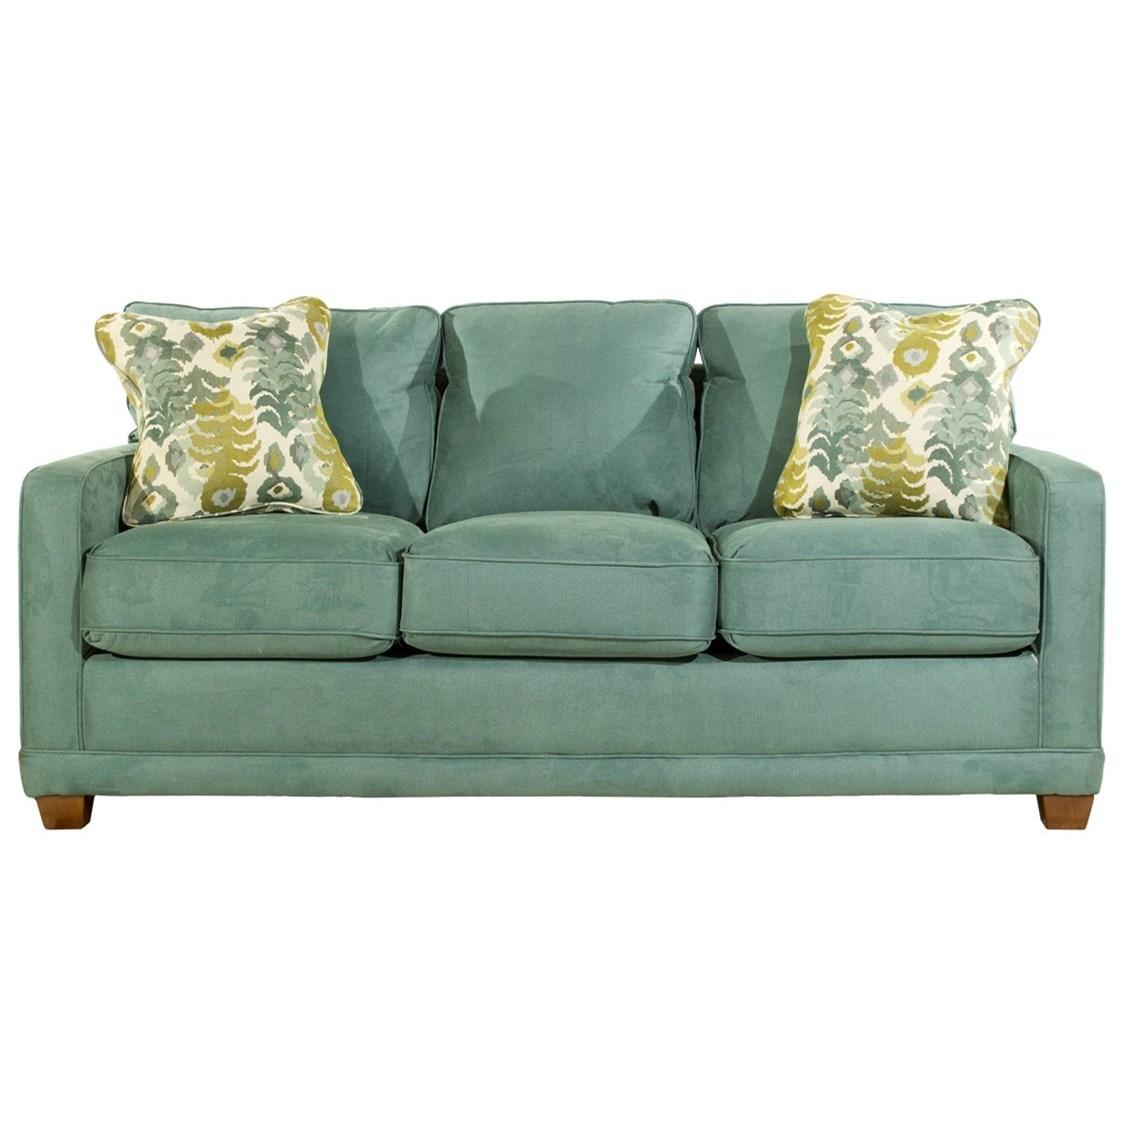 La Z Boy Kennedy Queen Memory Foam Sofabed   HomeWorld Furniture   Sleeper  Sofas